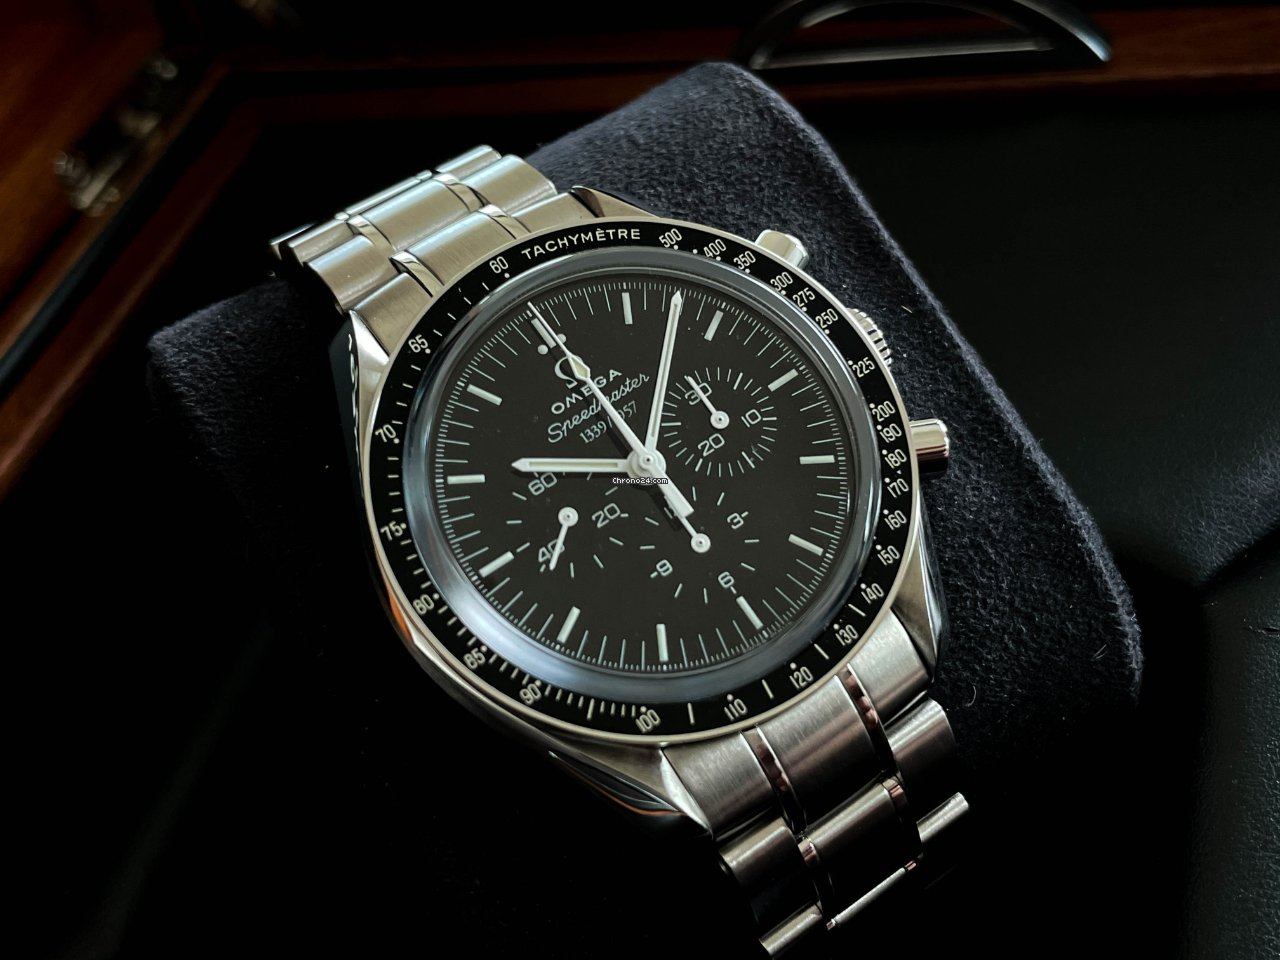 Omega Speedmaster Professional Moonwatch 311.33.42.50.01.001 2010 použité